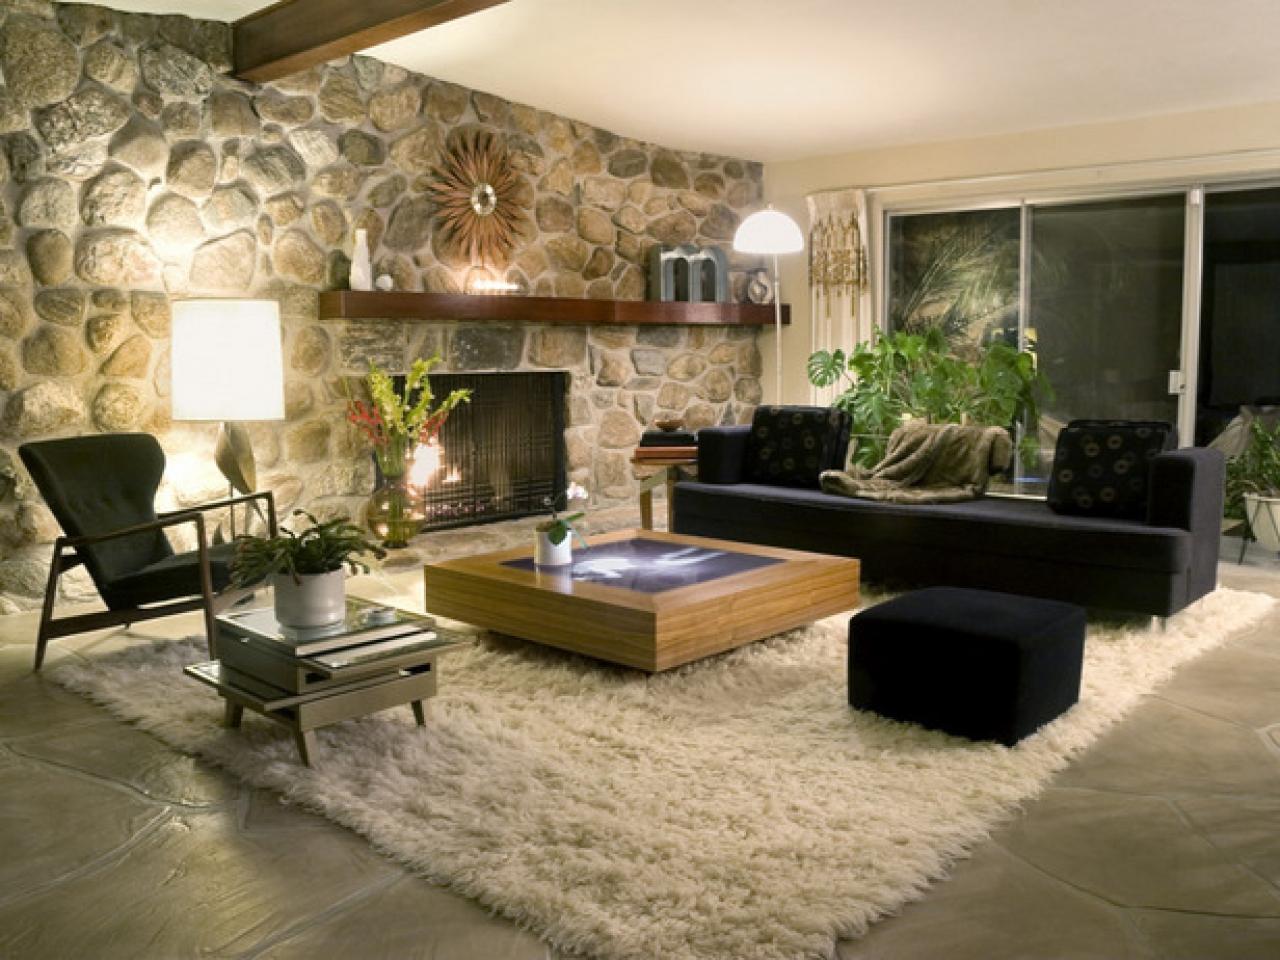 30 Modern Home Decor Ideas  The WoW Style